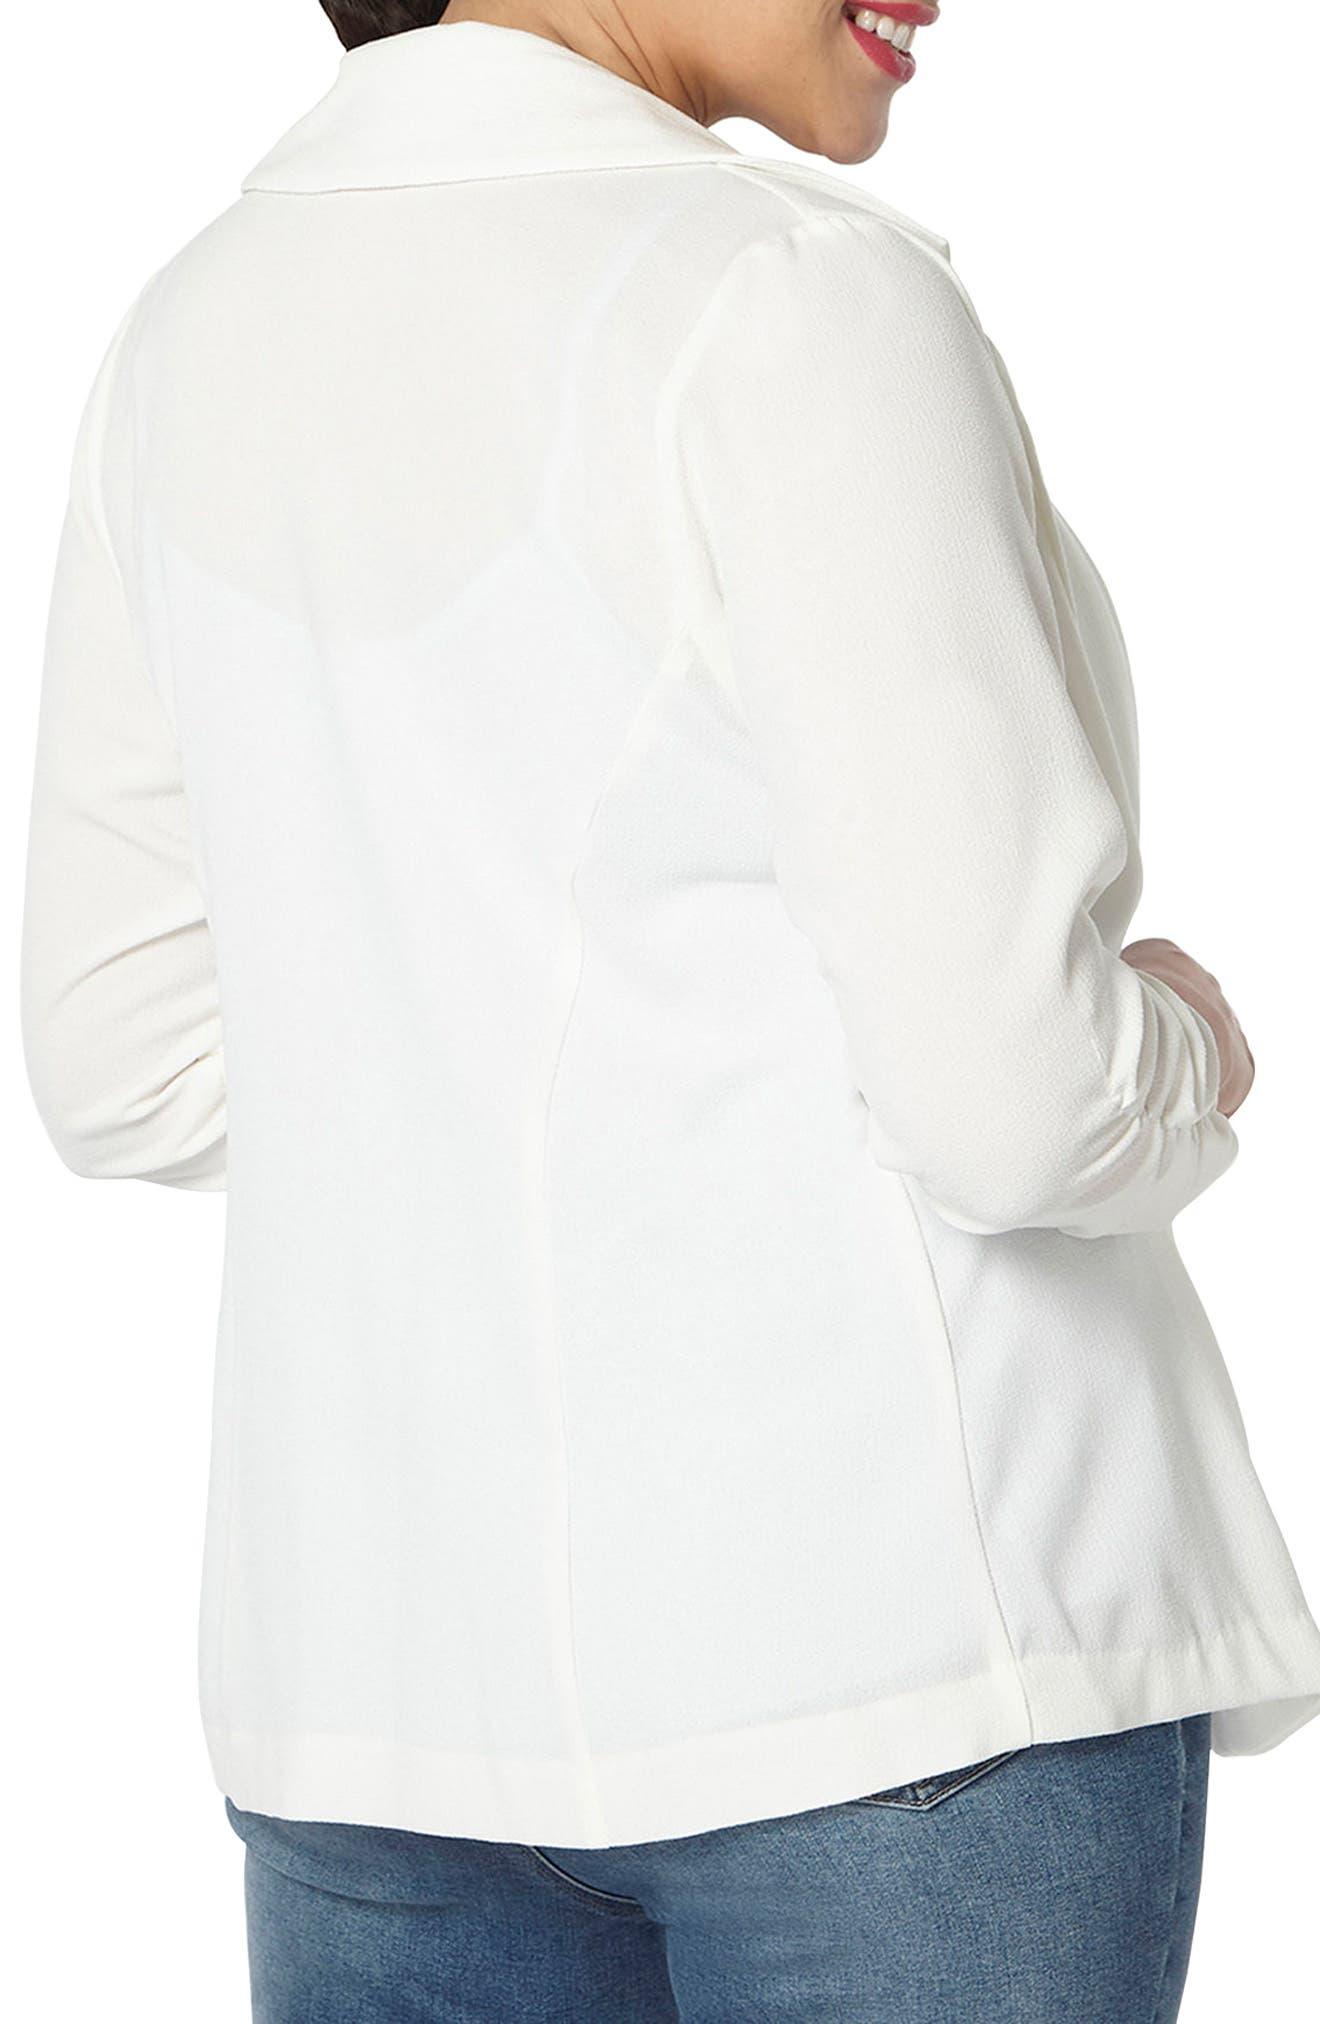 Alternate Image 2  - Evans Crepe Blazer (Plus Size)